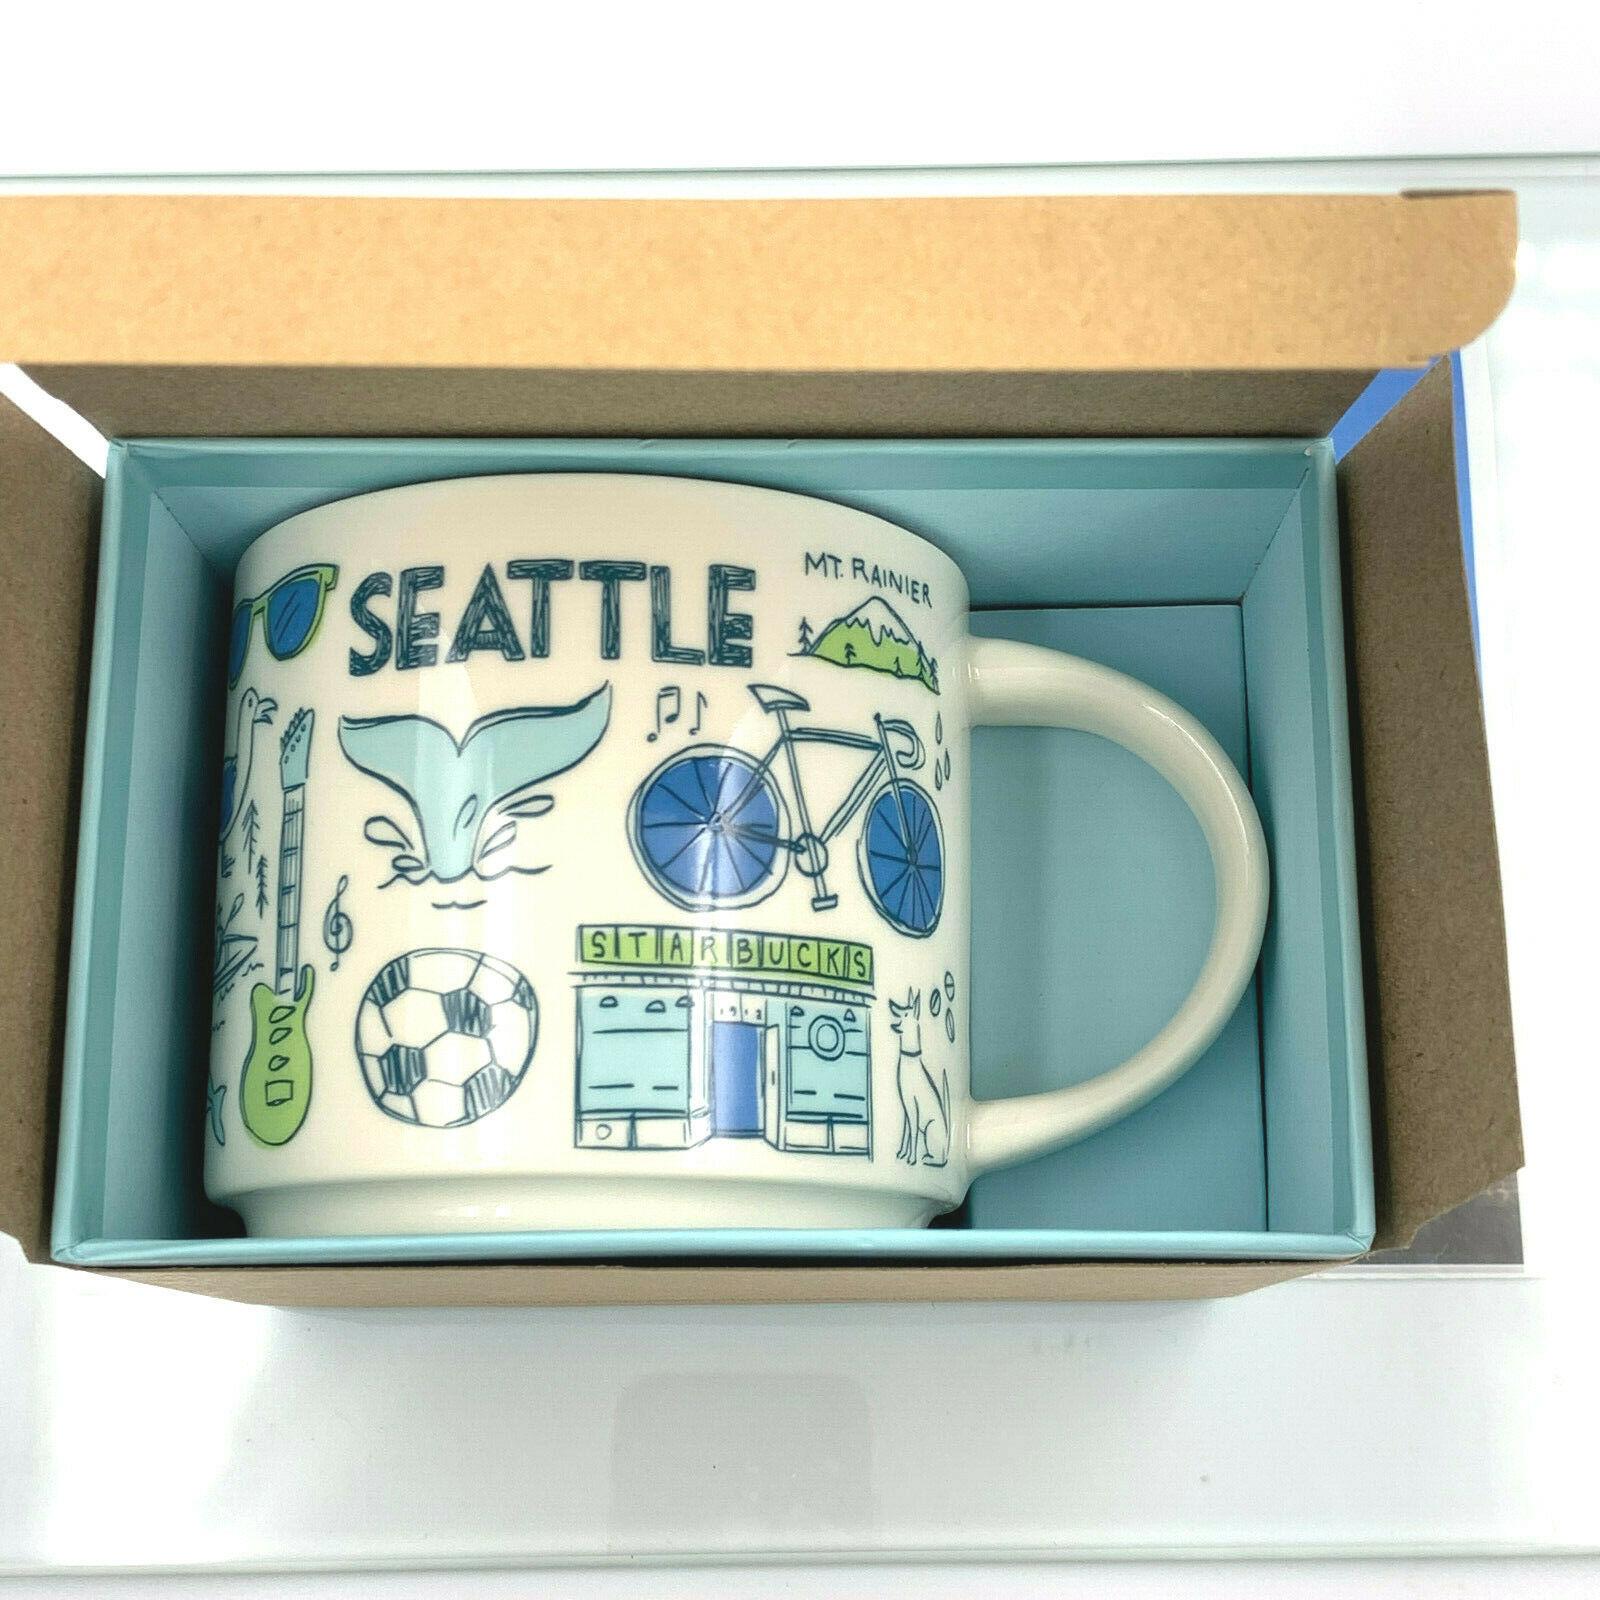 Starbucks Coffee Ceramic Mug Cup USA World Collection Coffee Tea Hot 14 oz Gift image 8